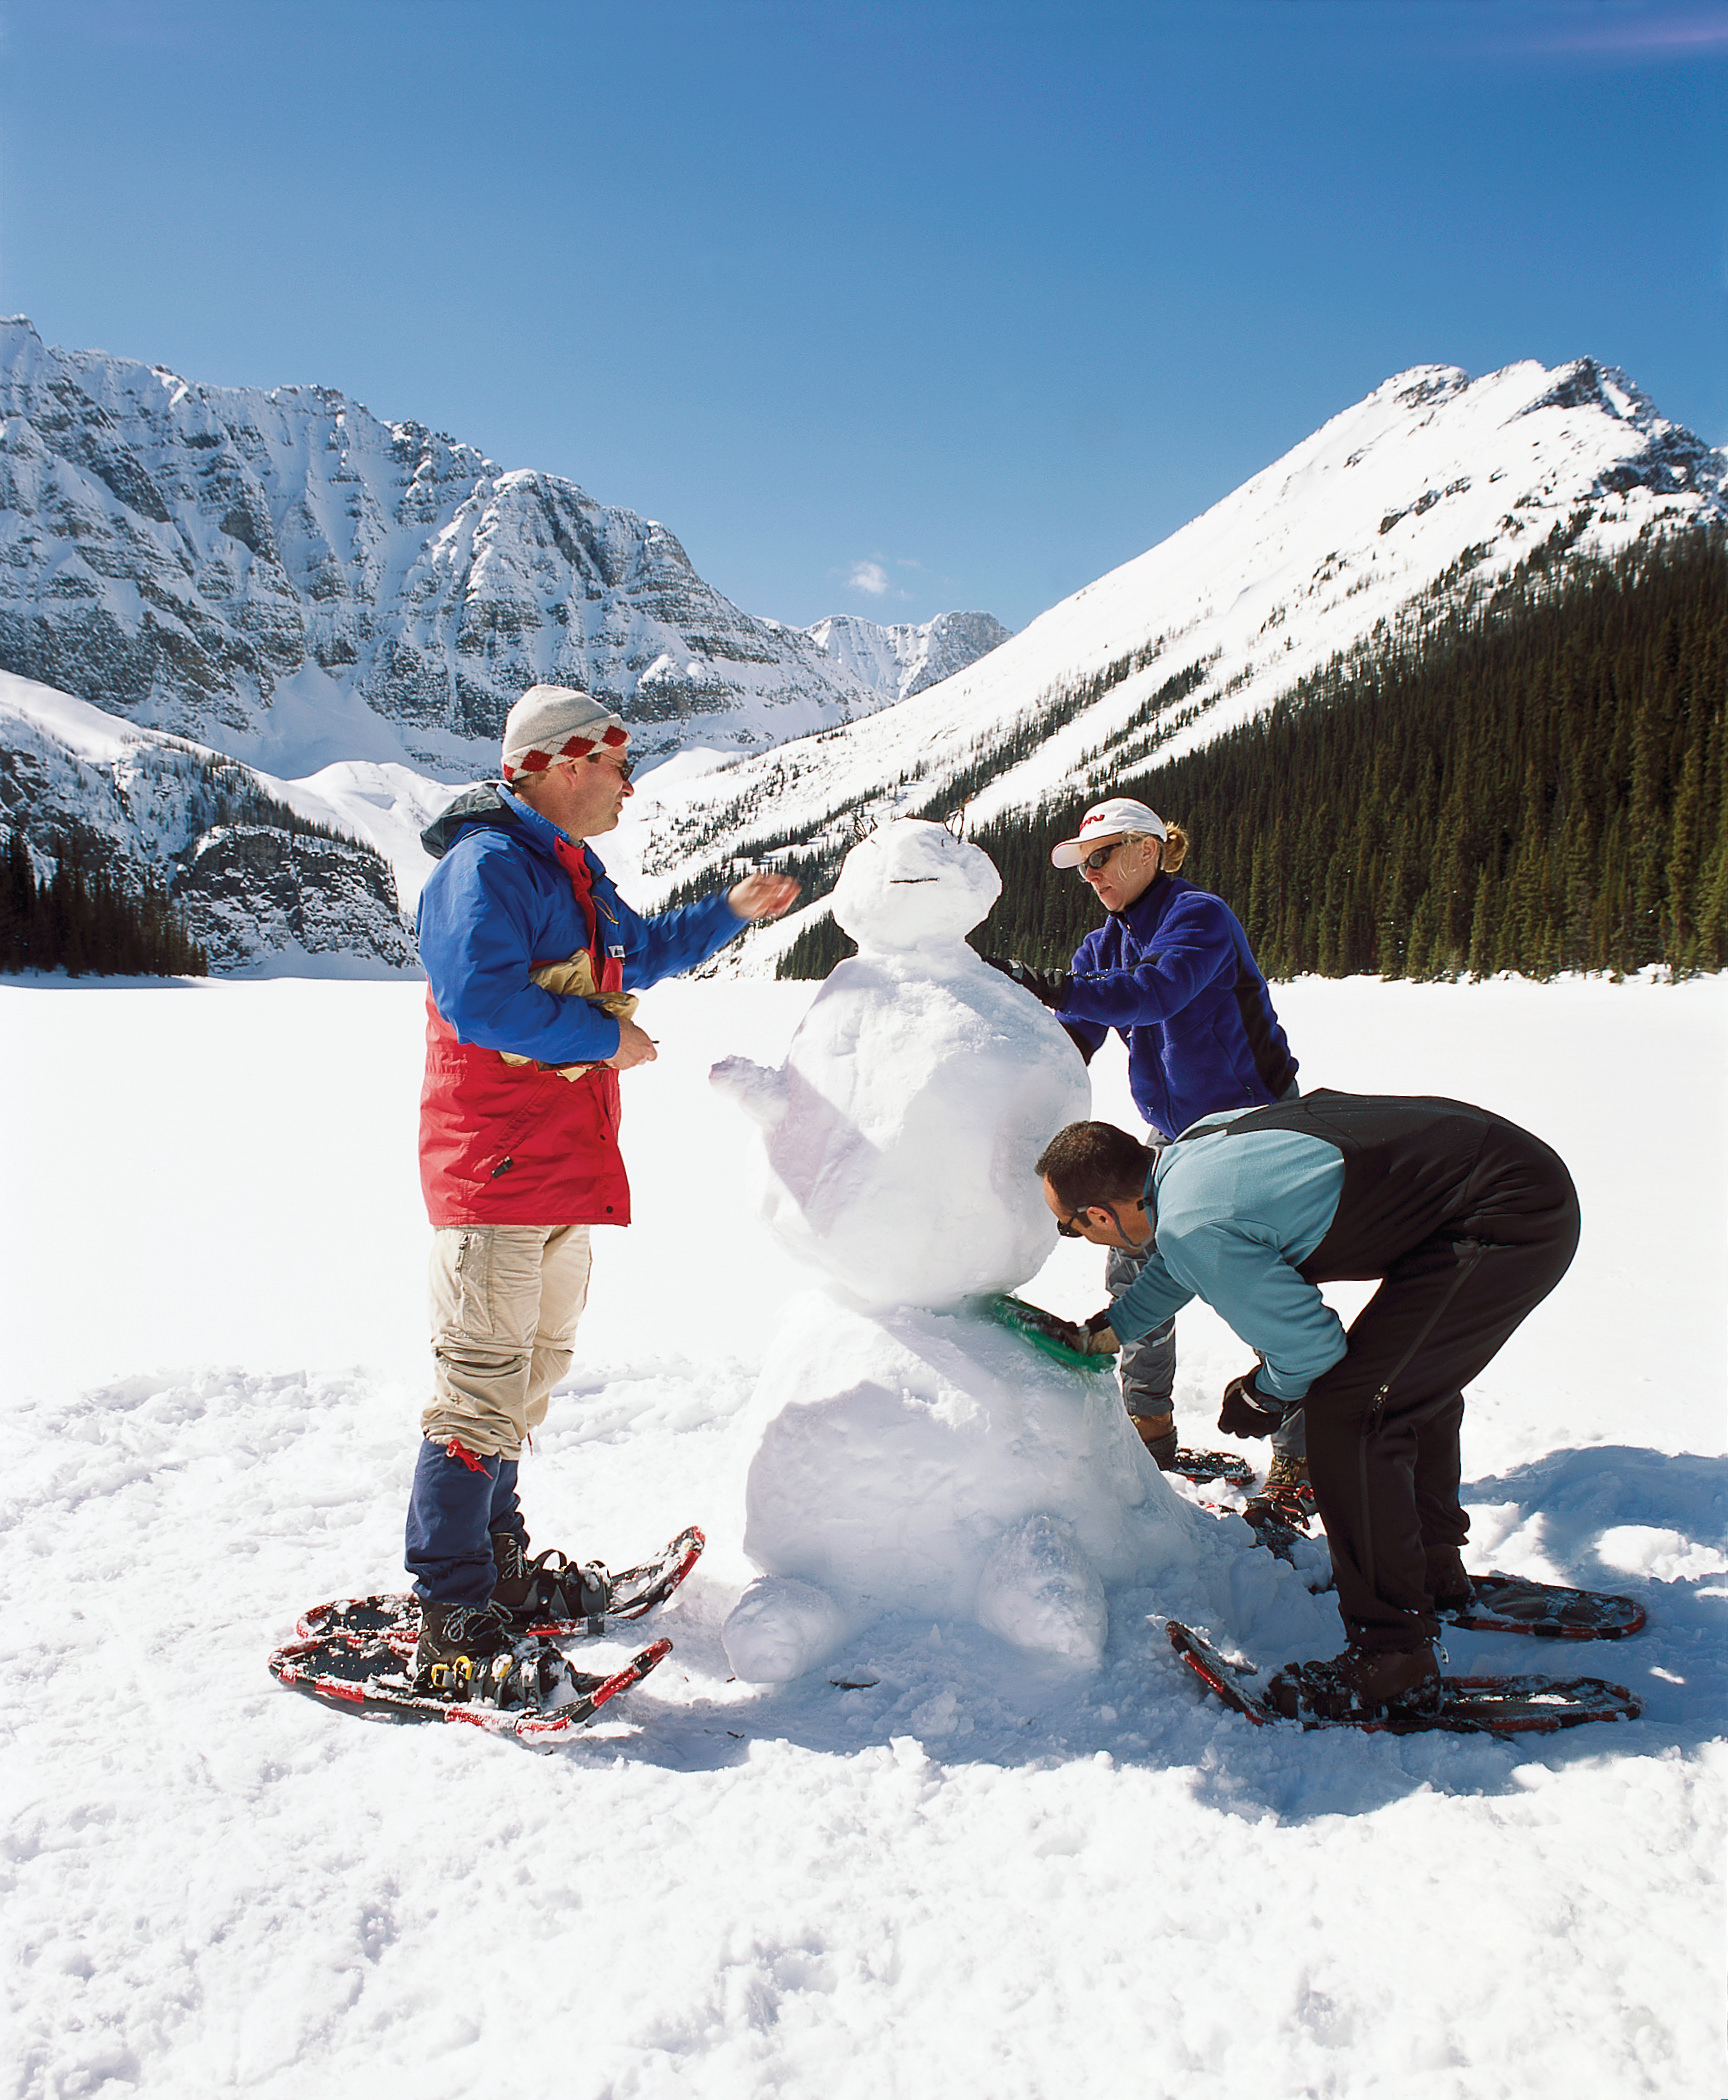 Photo courtesy of Tourism Calgary